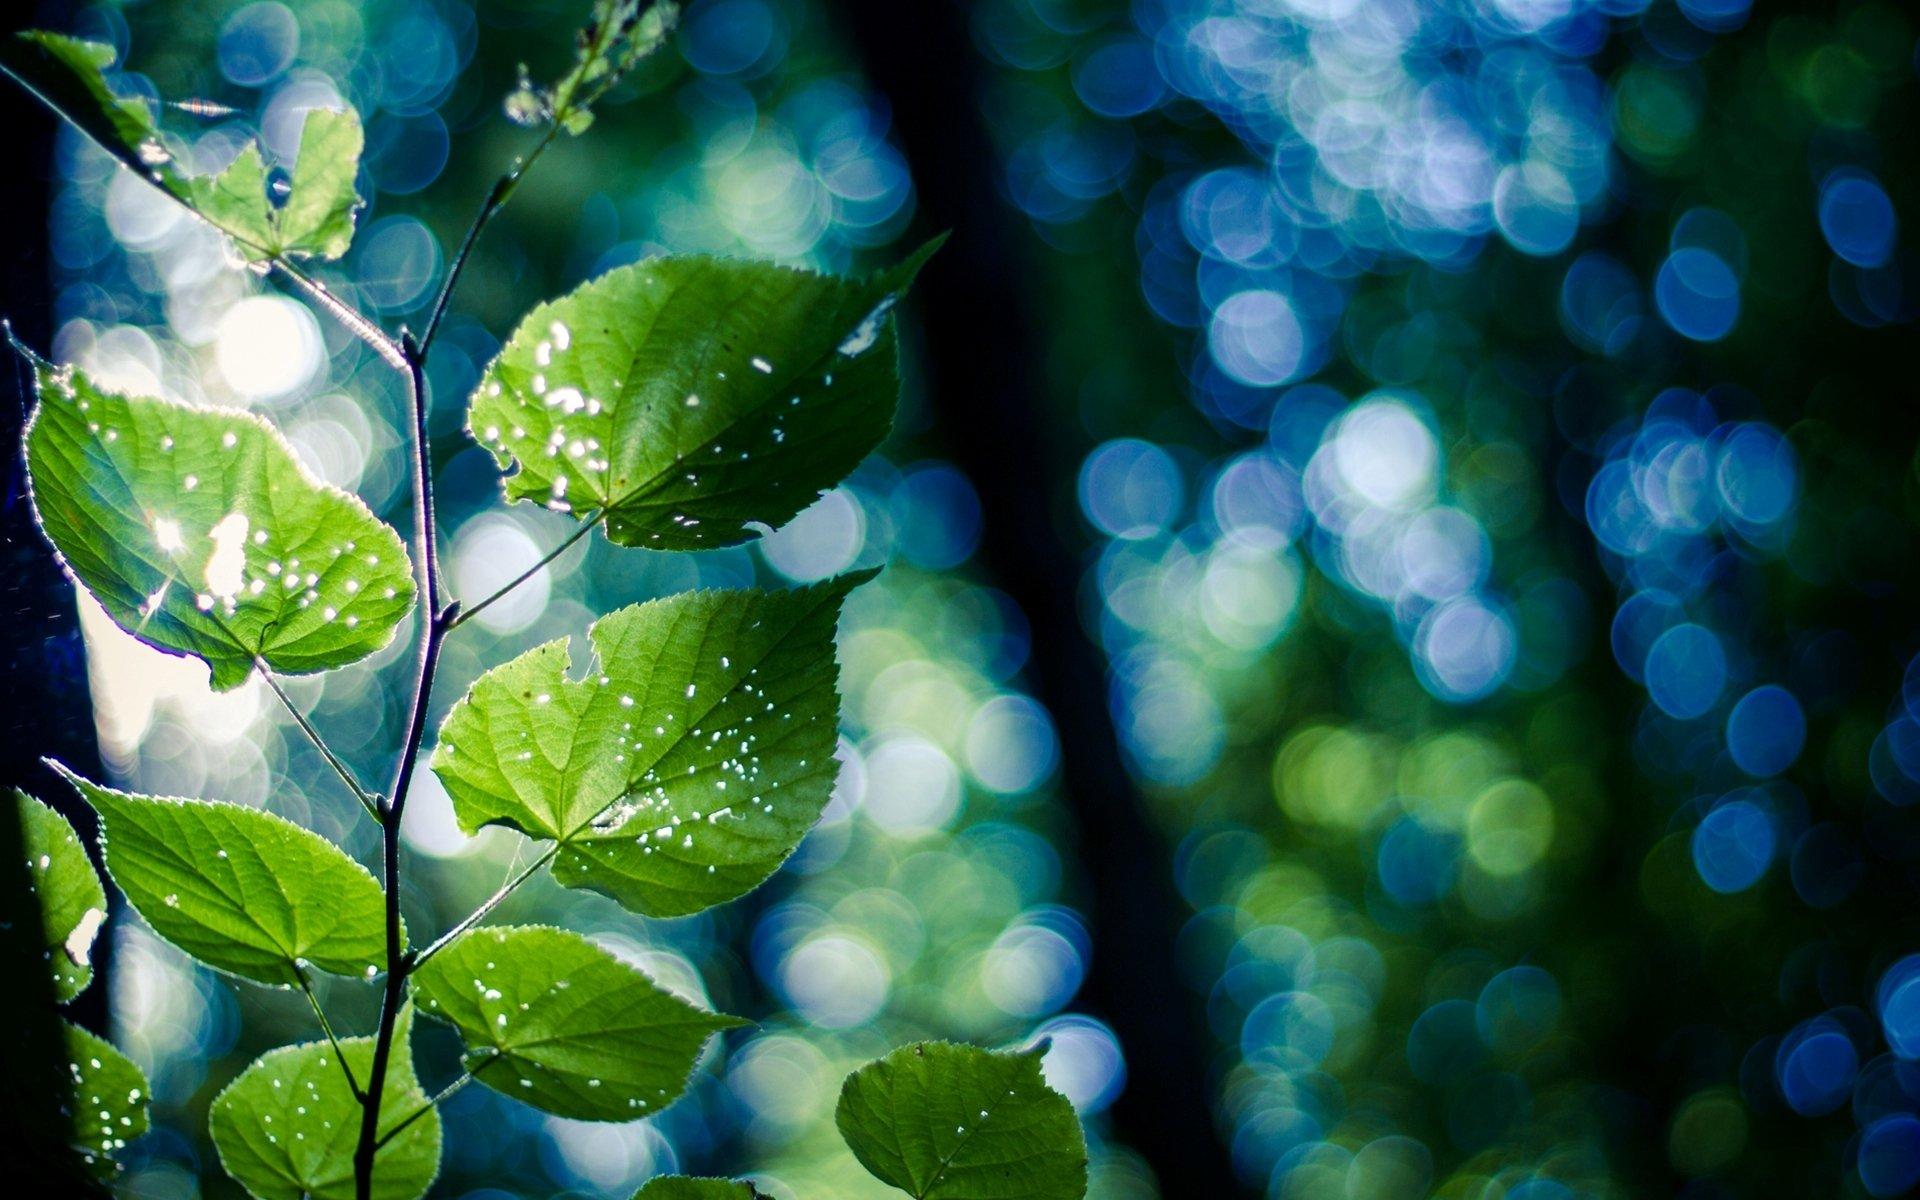 Картинки в сине зеленом цвете